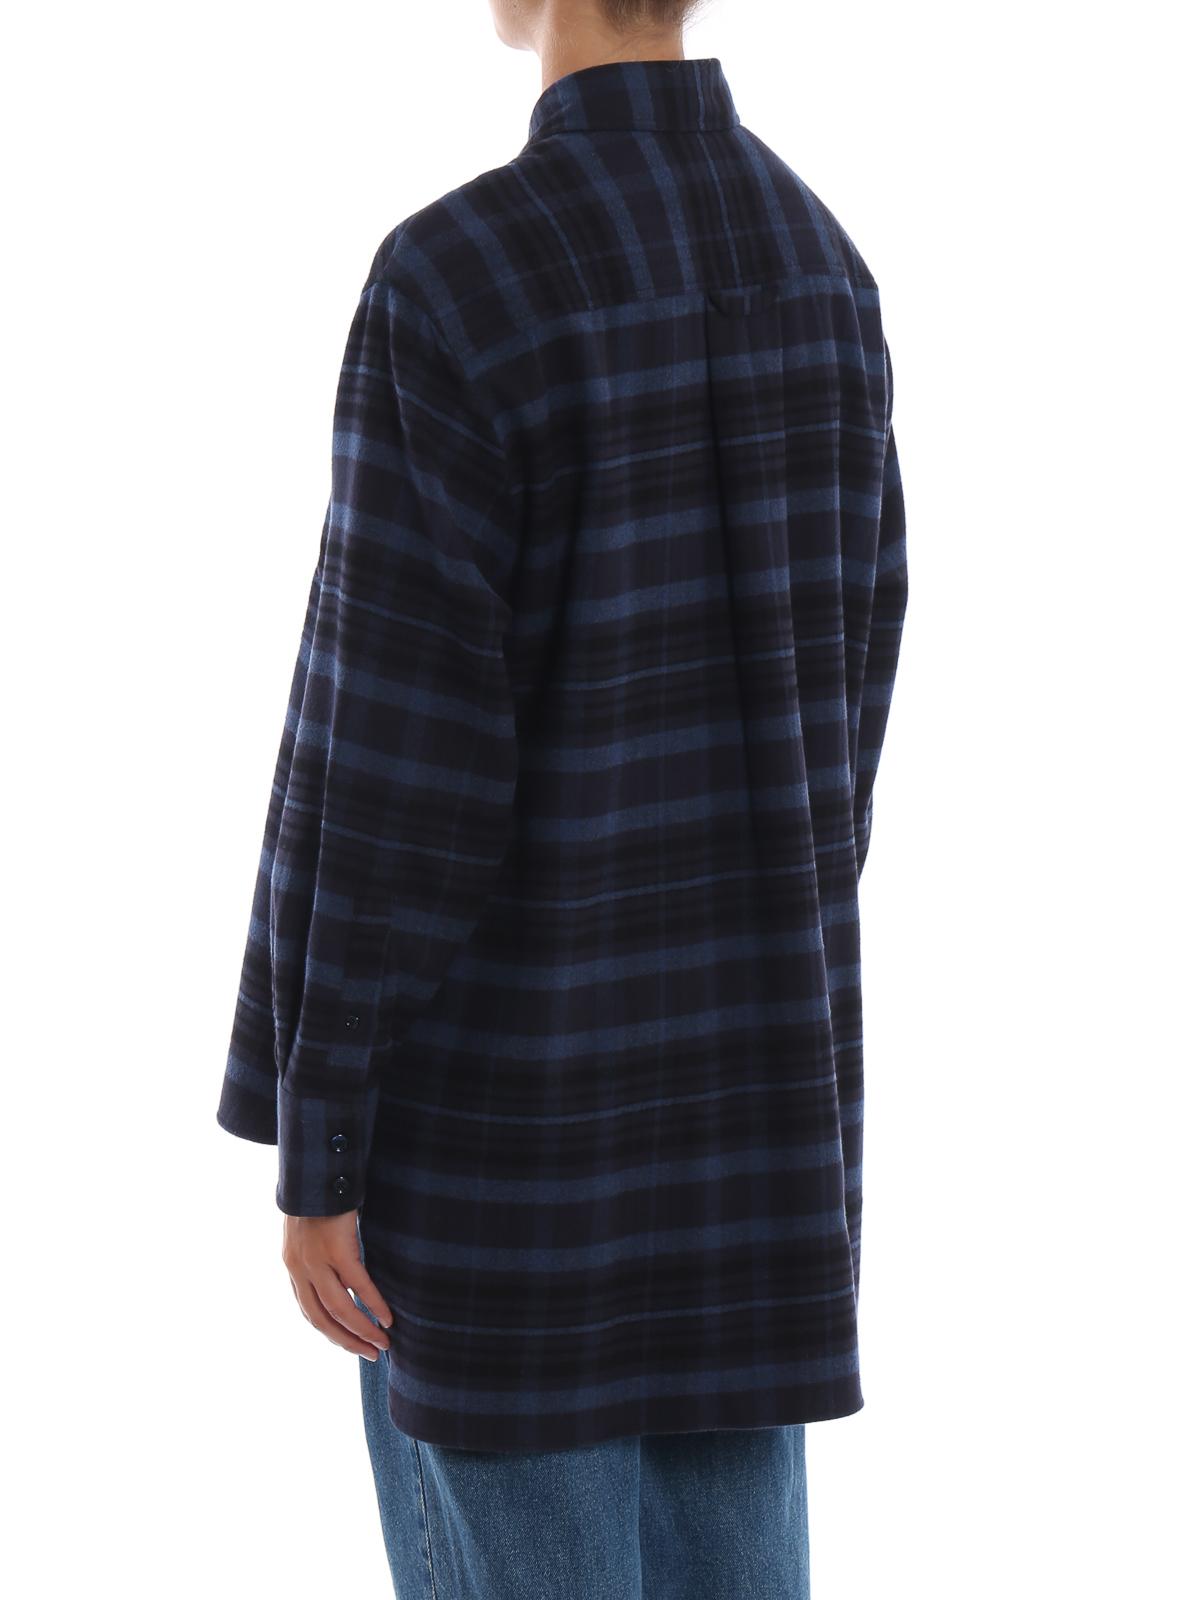 Ripa tartan cotton flannel shirt